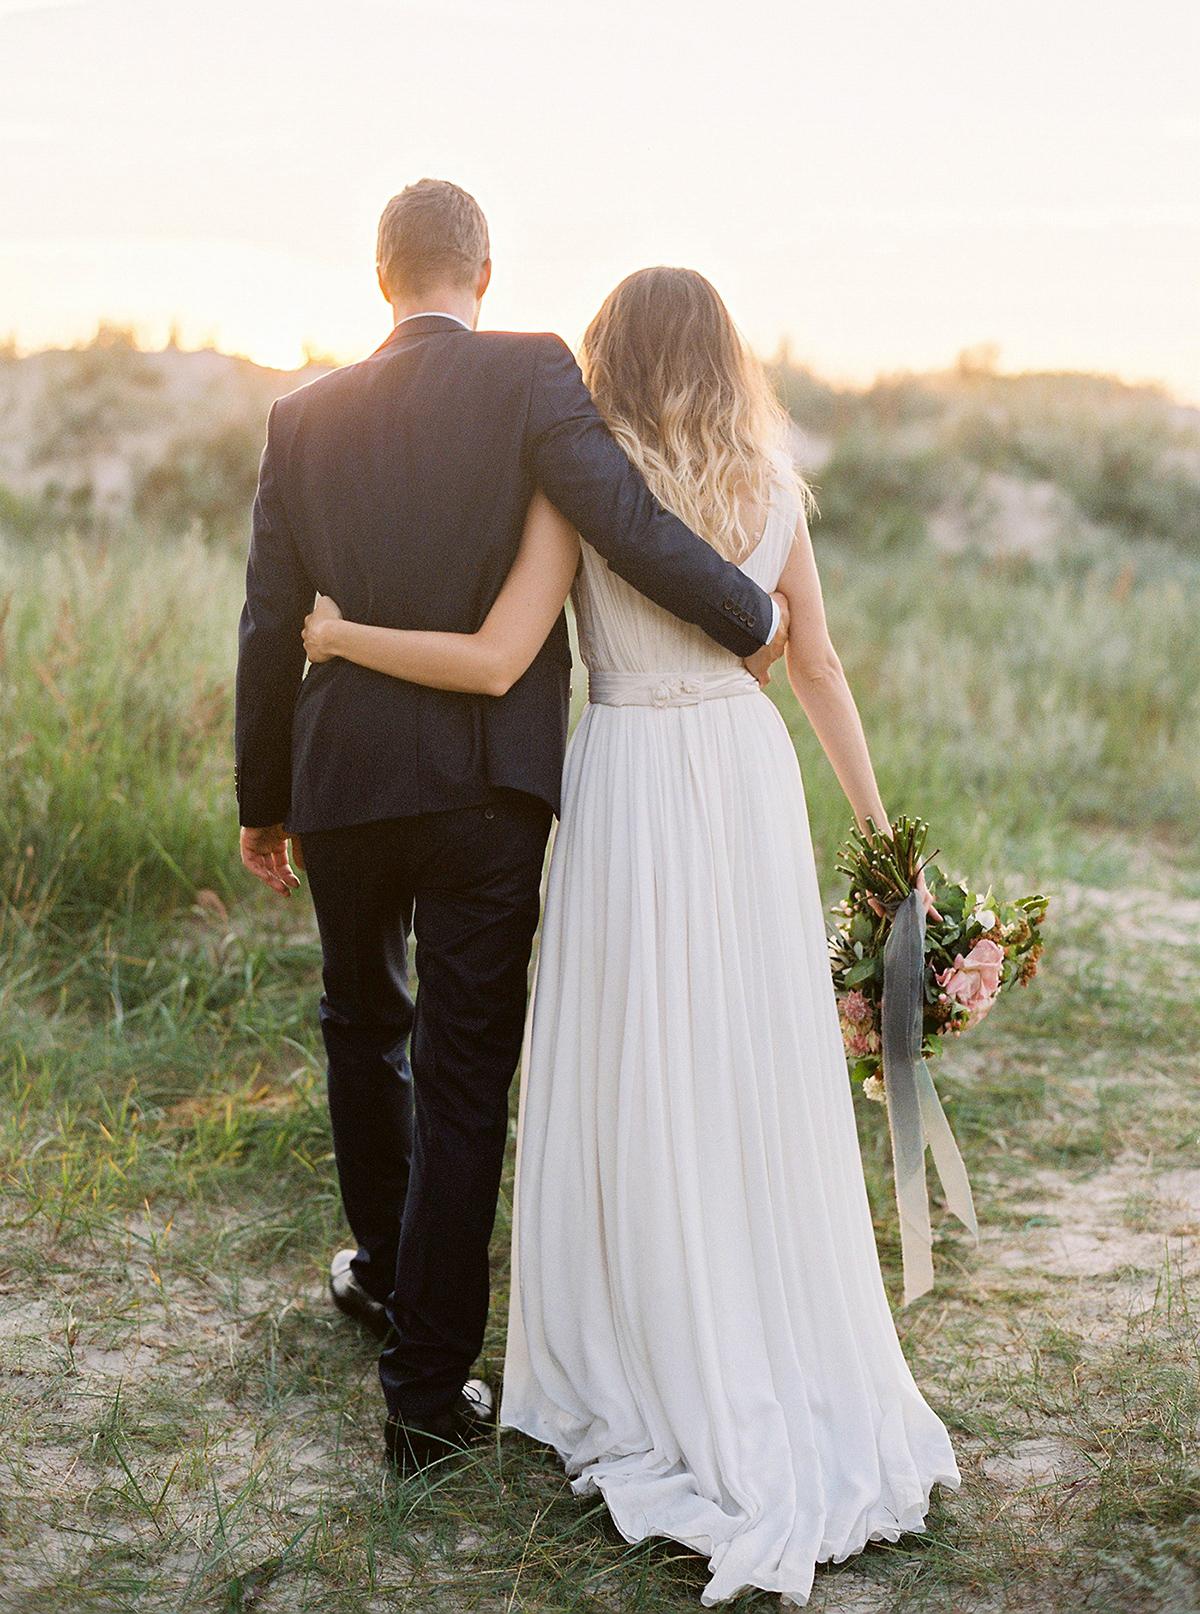 Barefoot Bride (Romance on the Go)